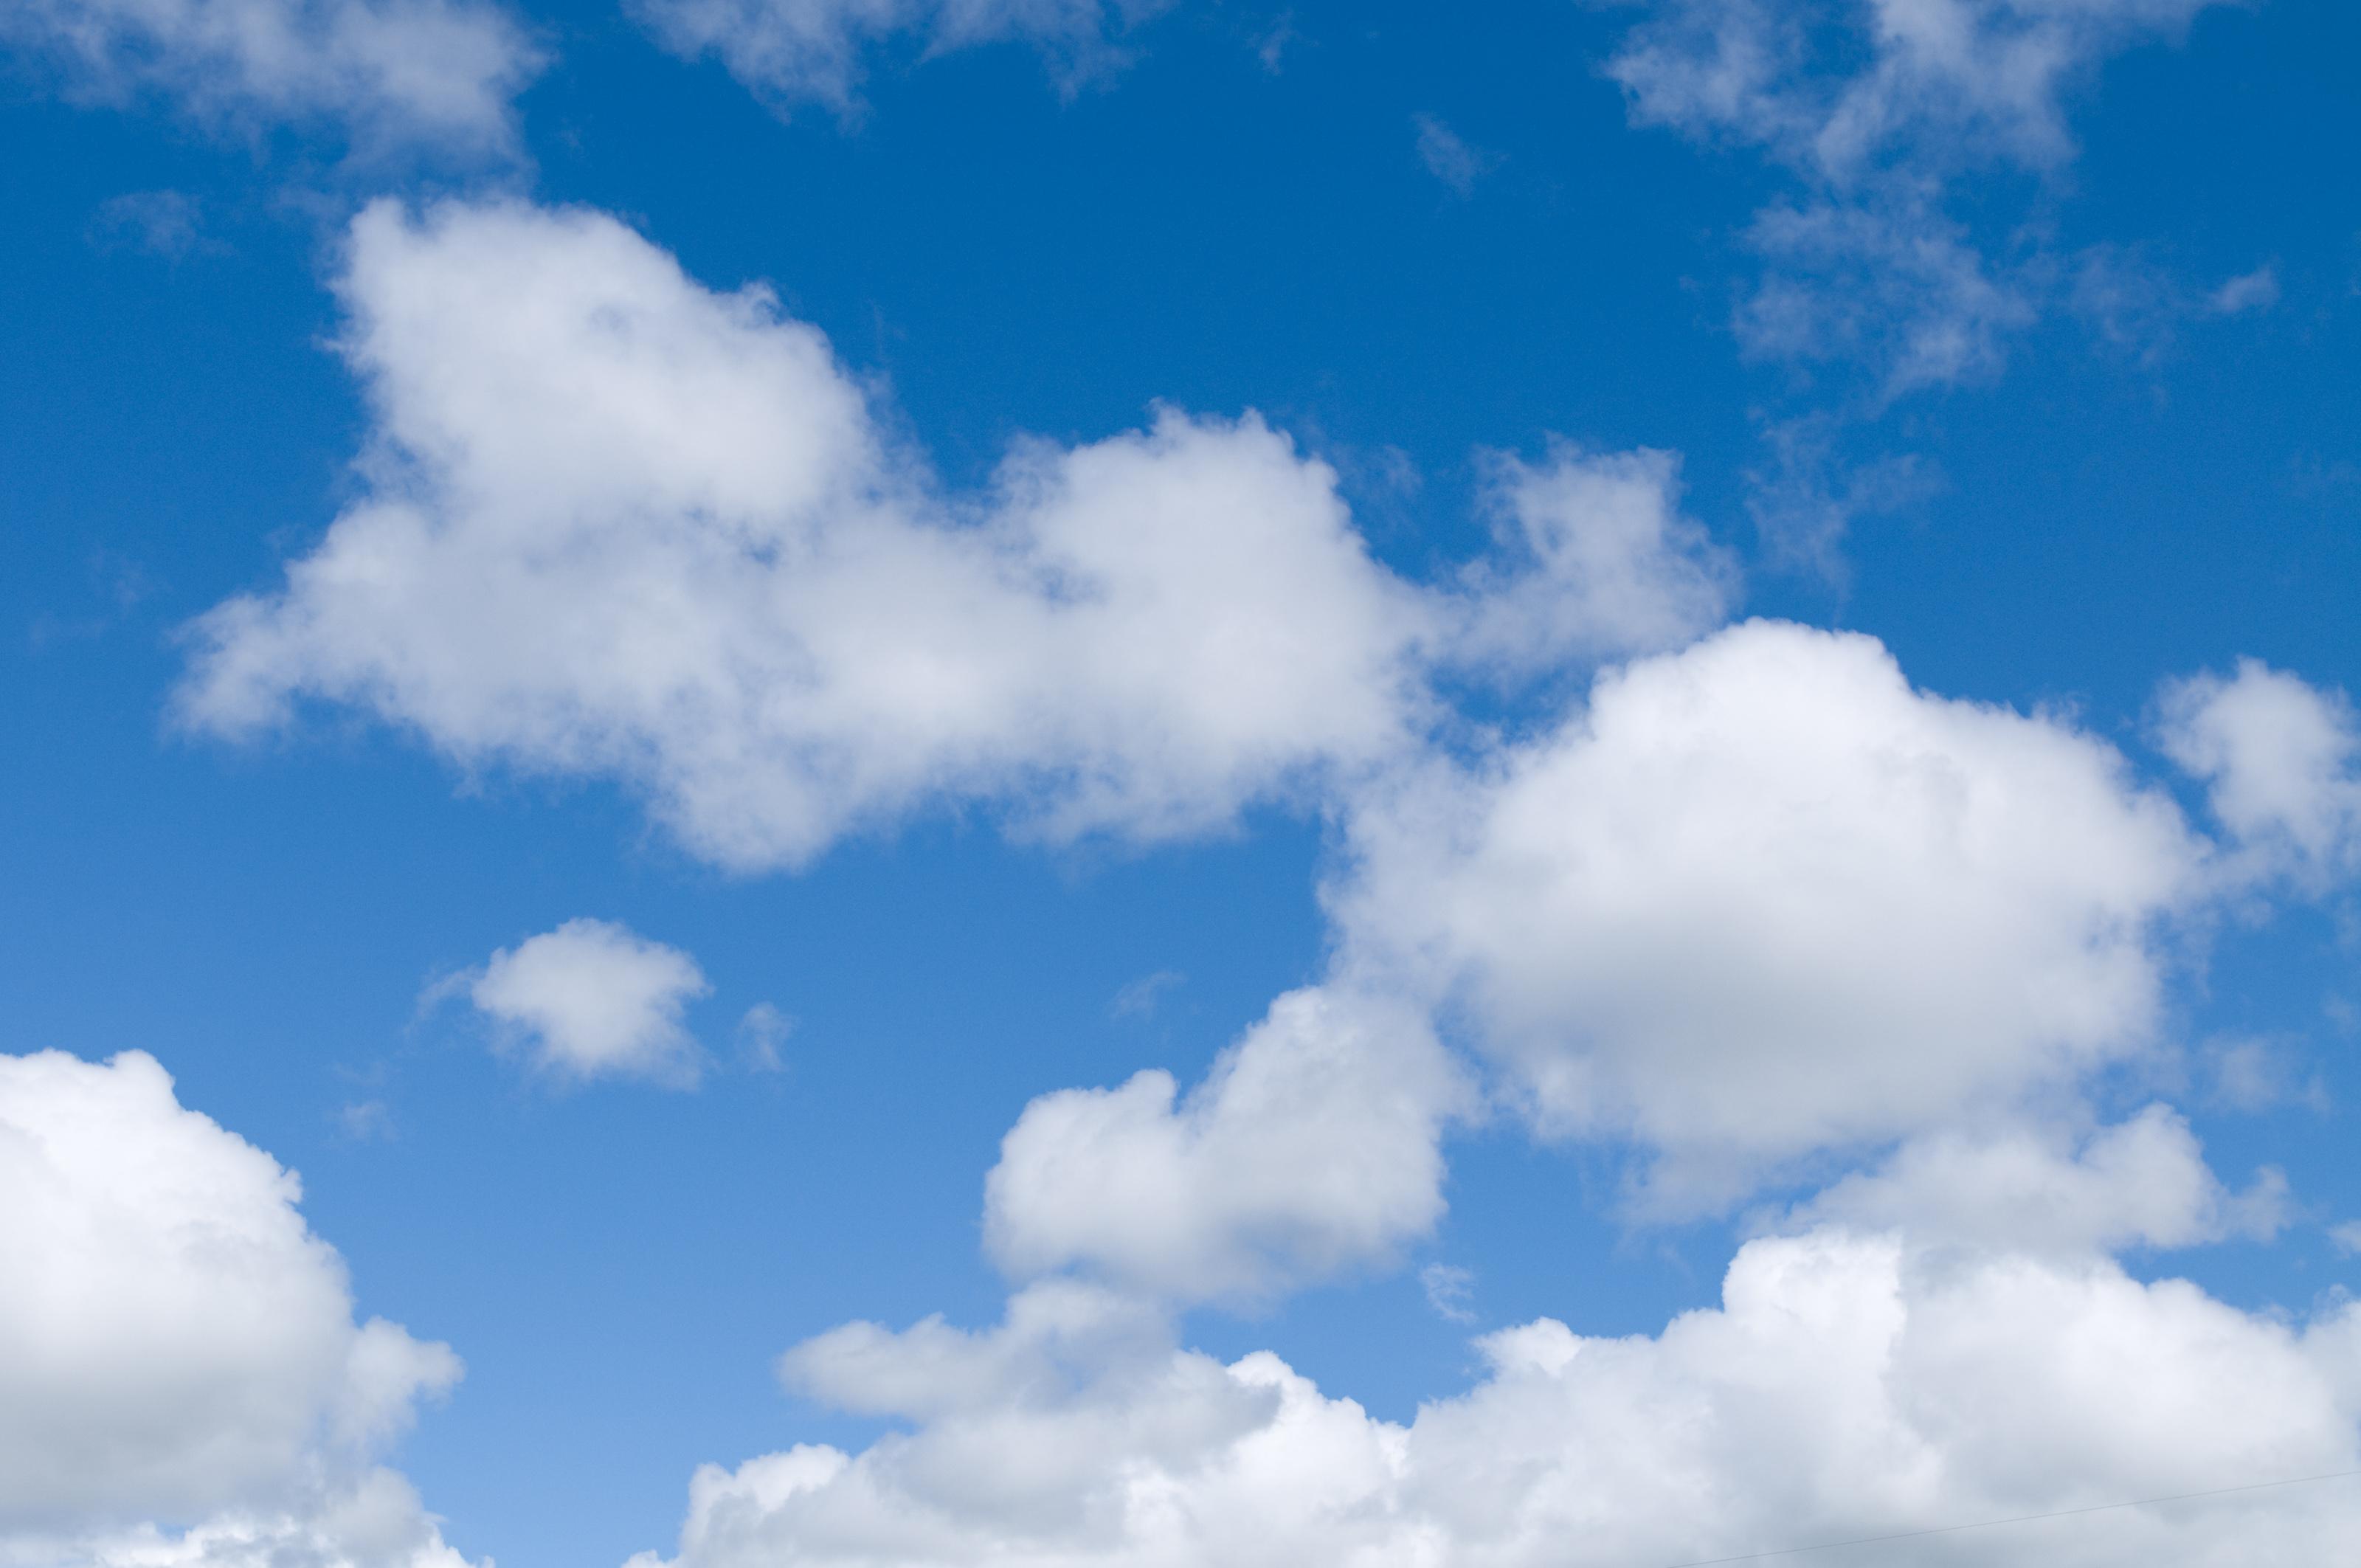 Cloud Blue Sky Clouds Background 3200x2125